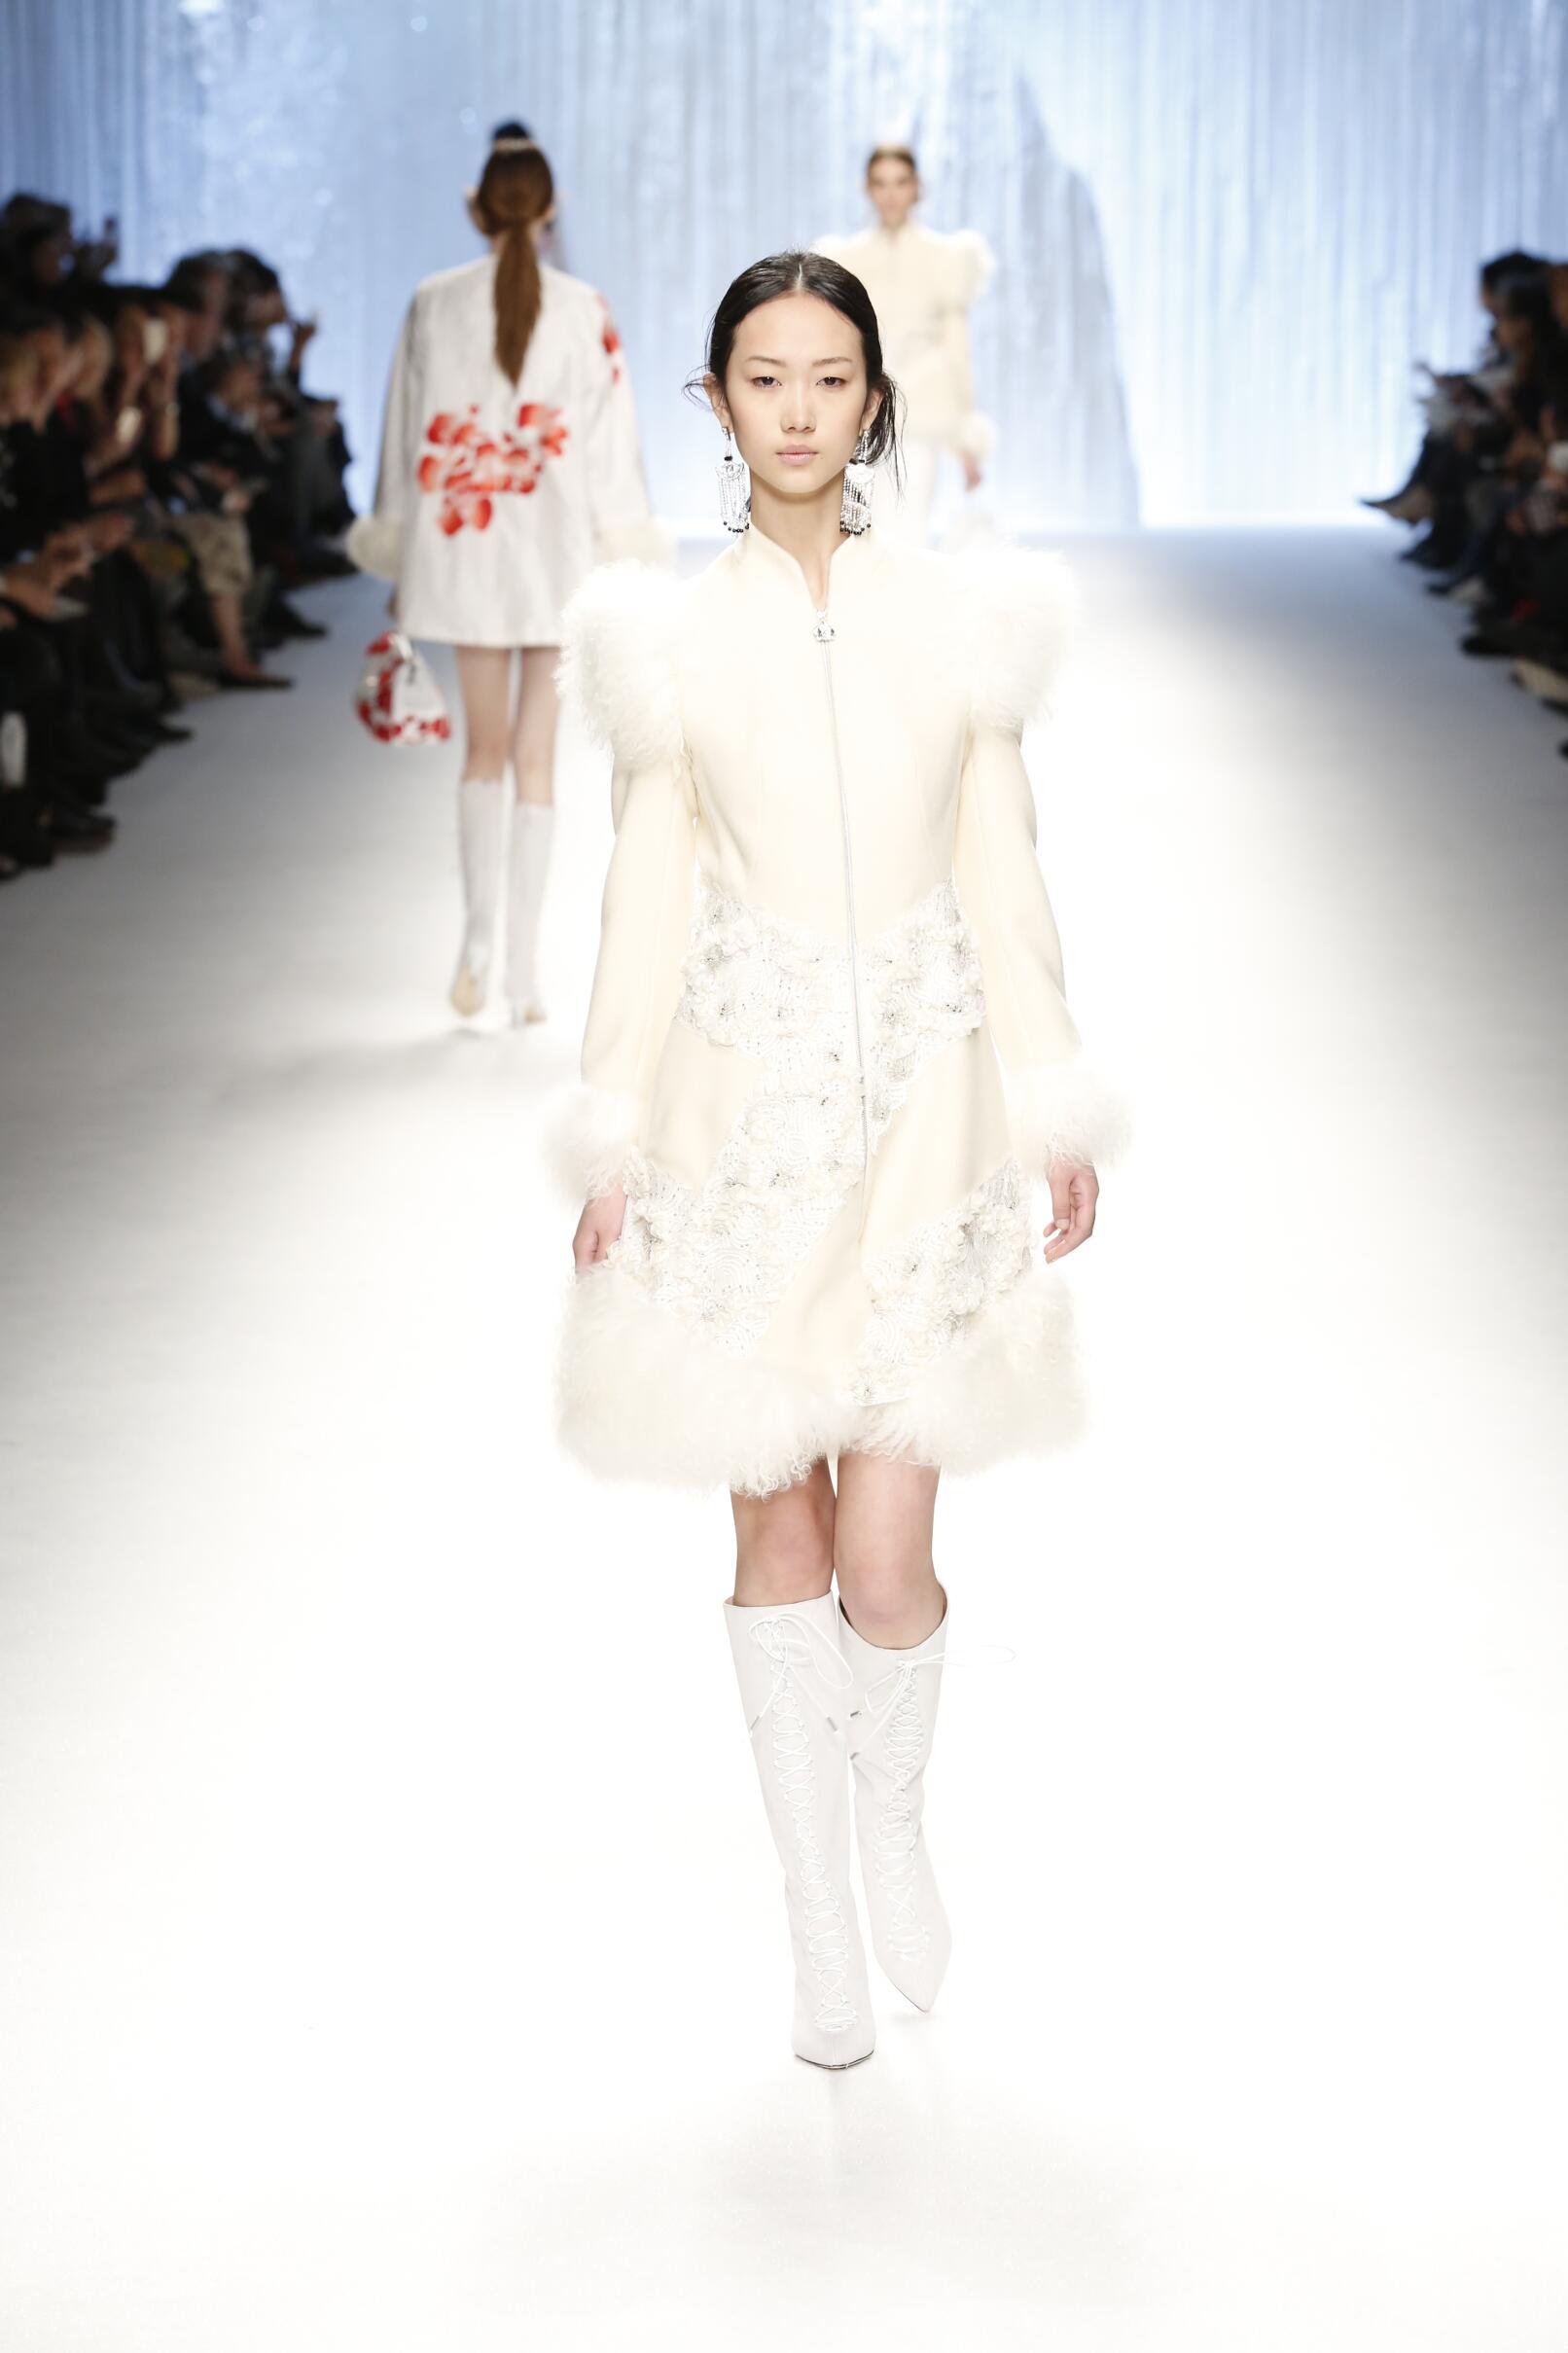 Fashion Show FW 2015 2016 Shiatzy Chen Womenswear